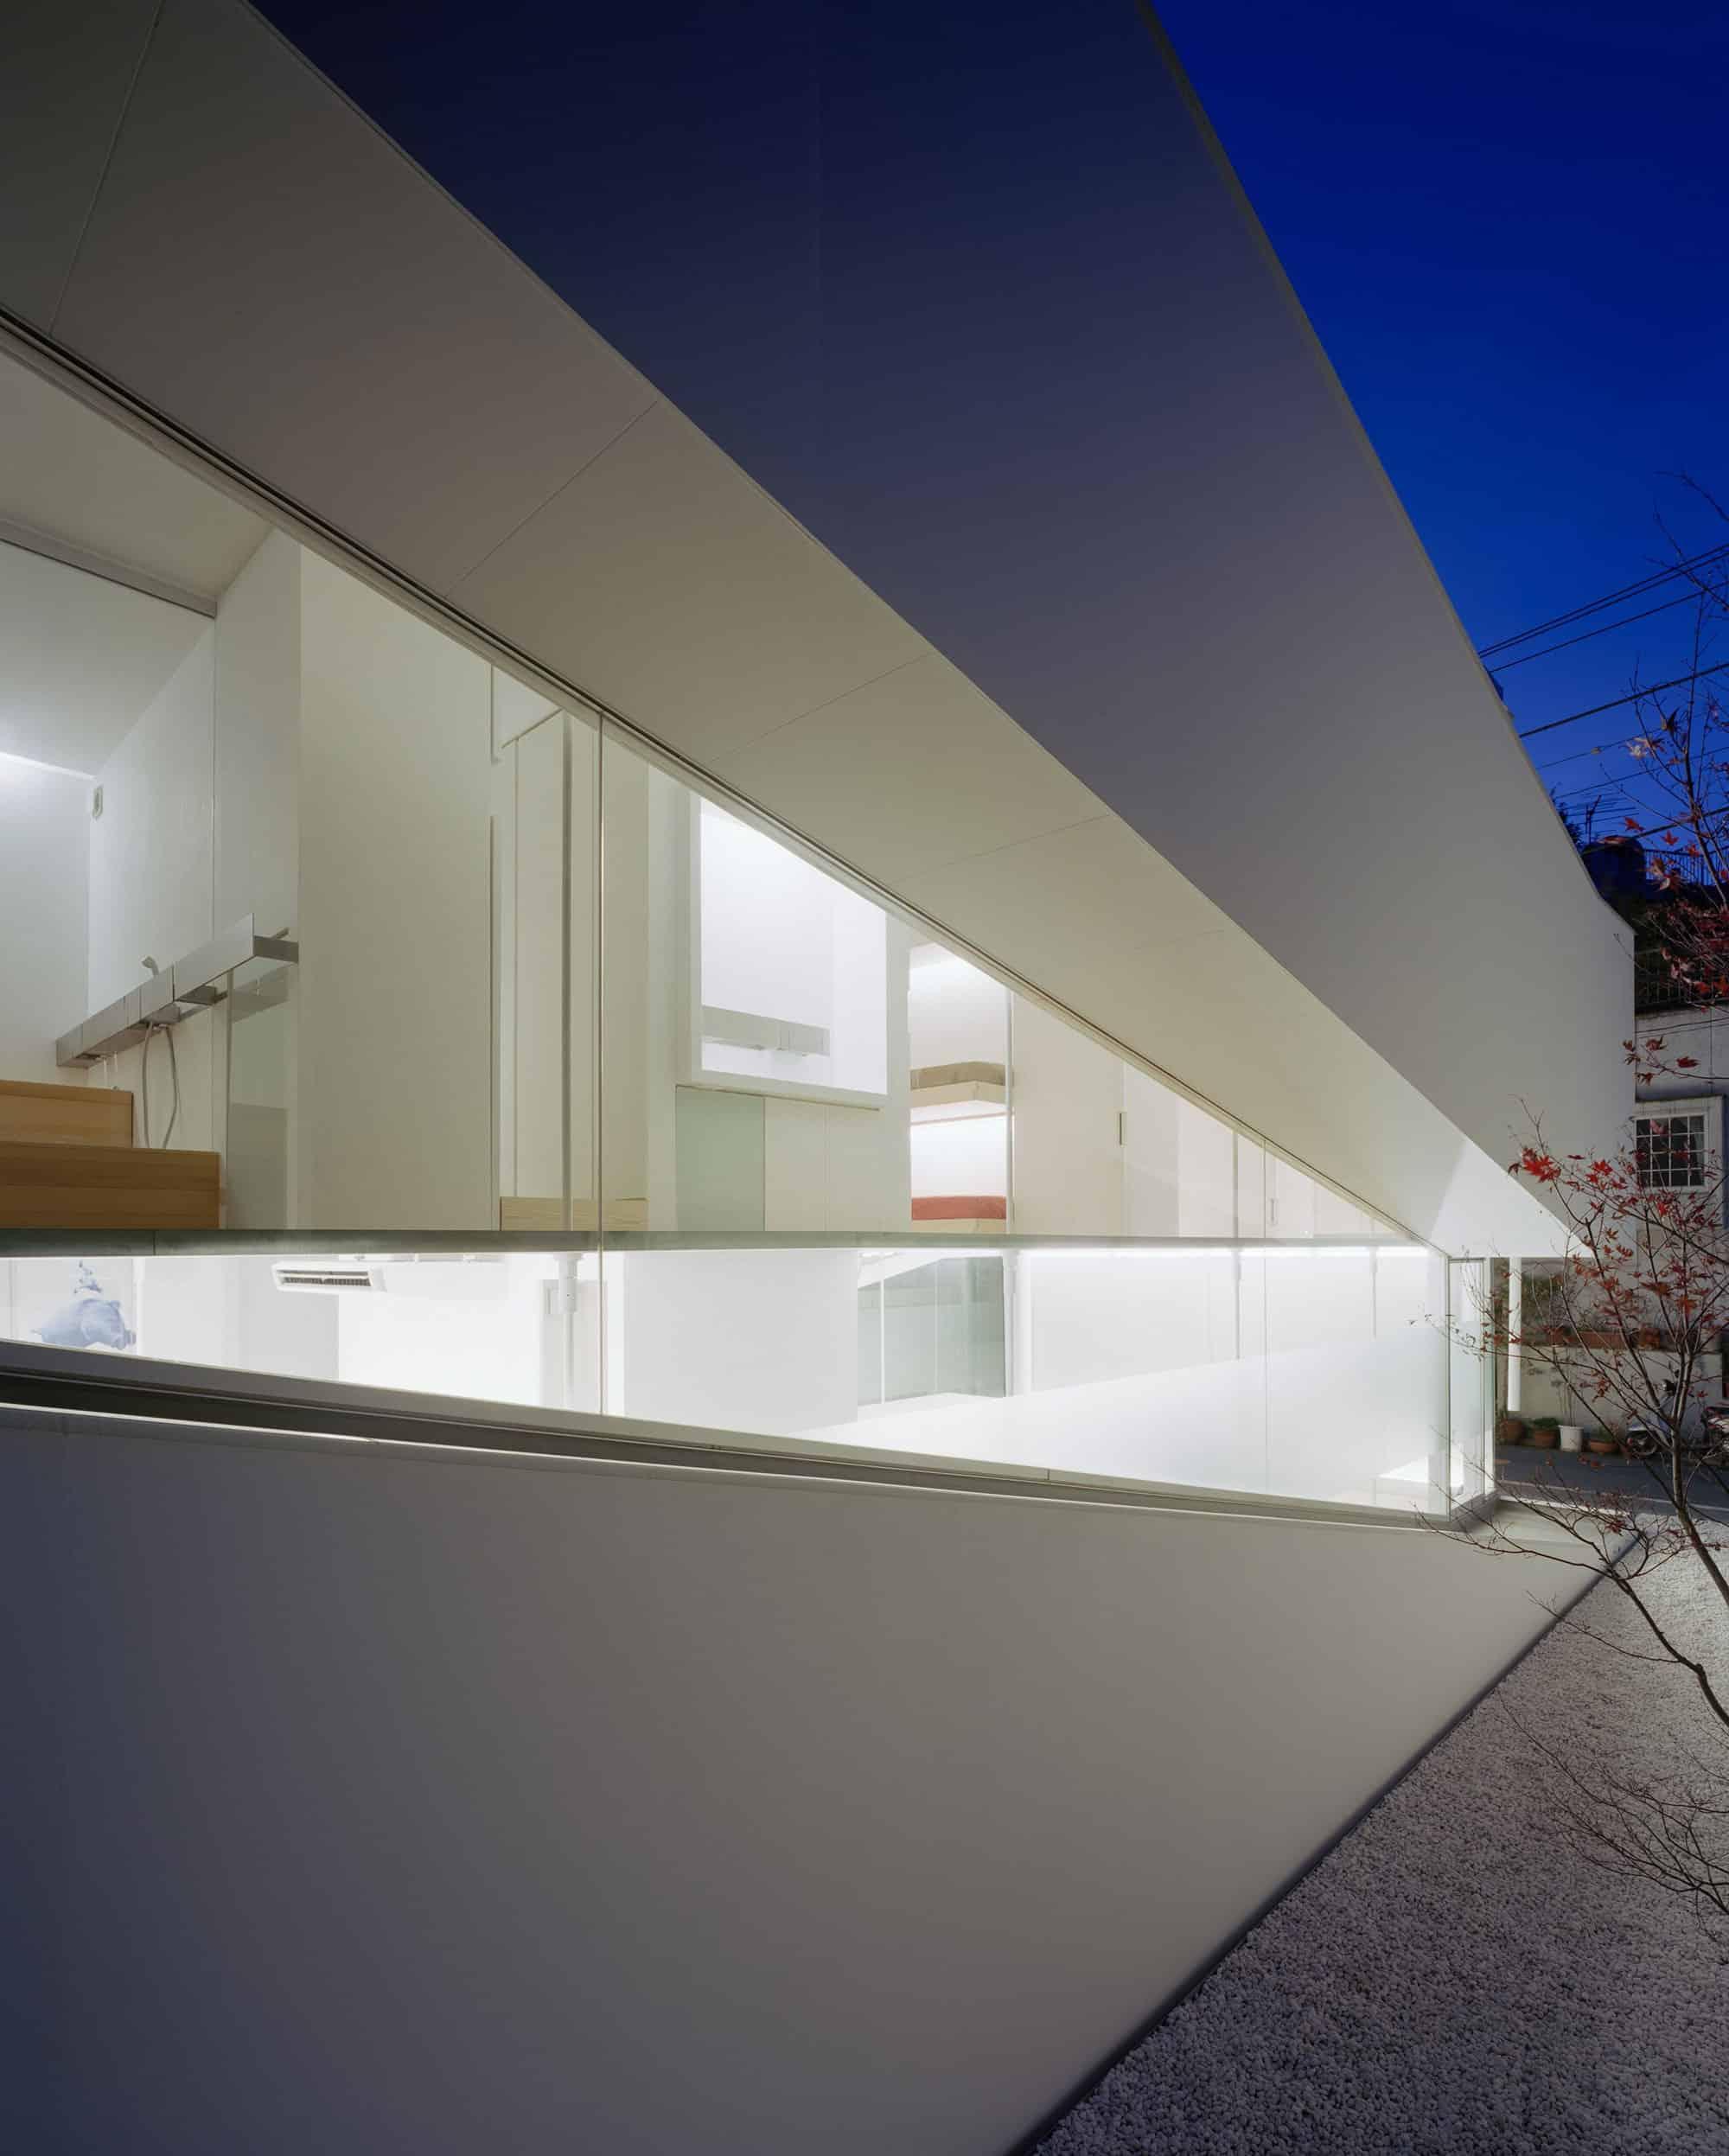 C1 House by Curiosity Architects (3)